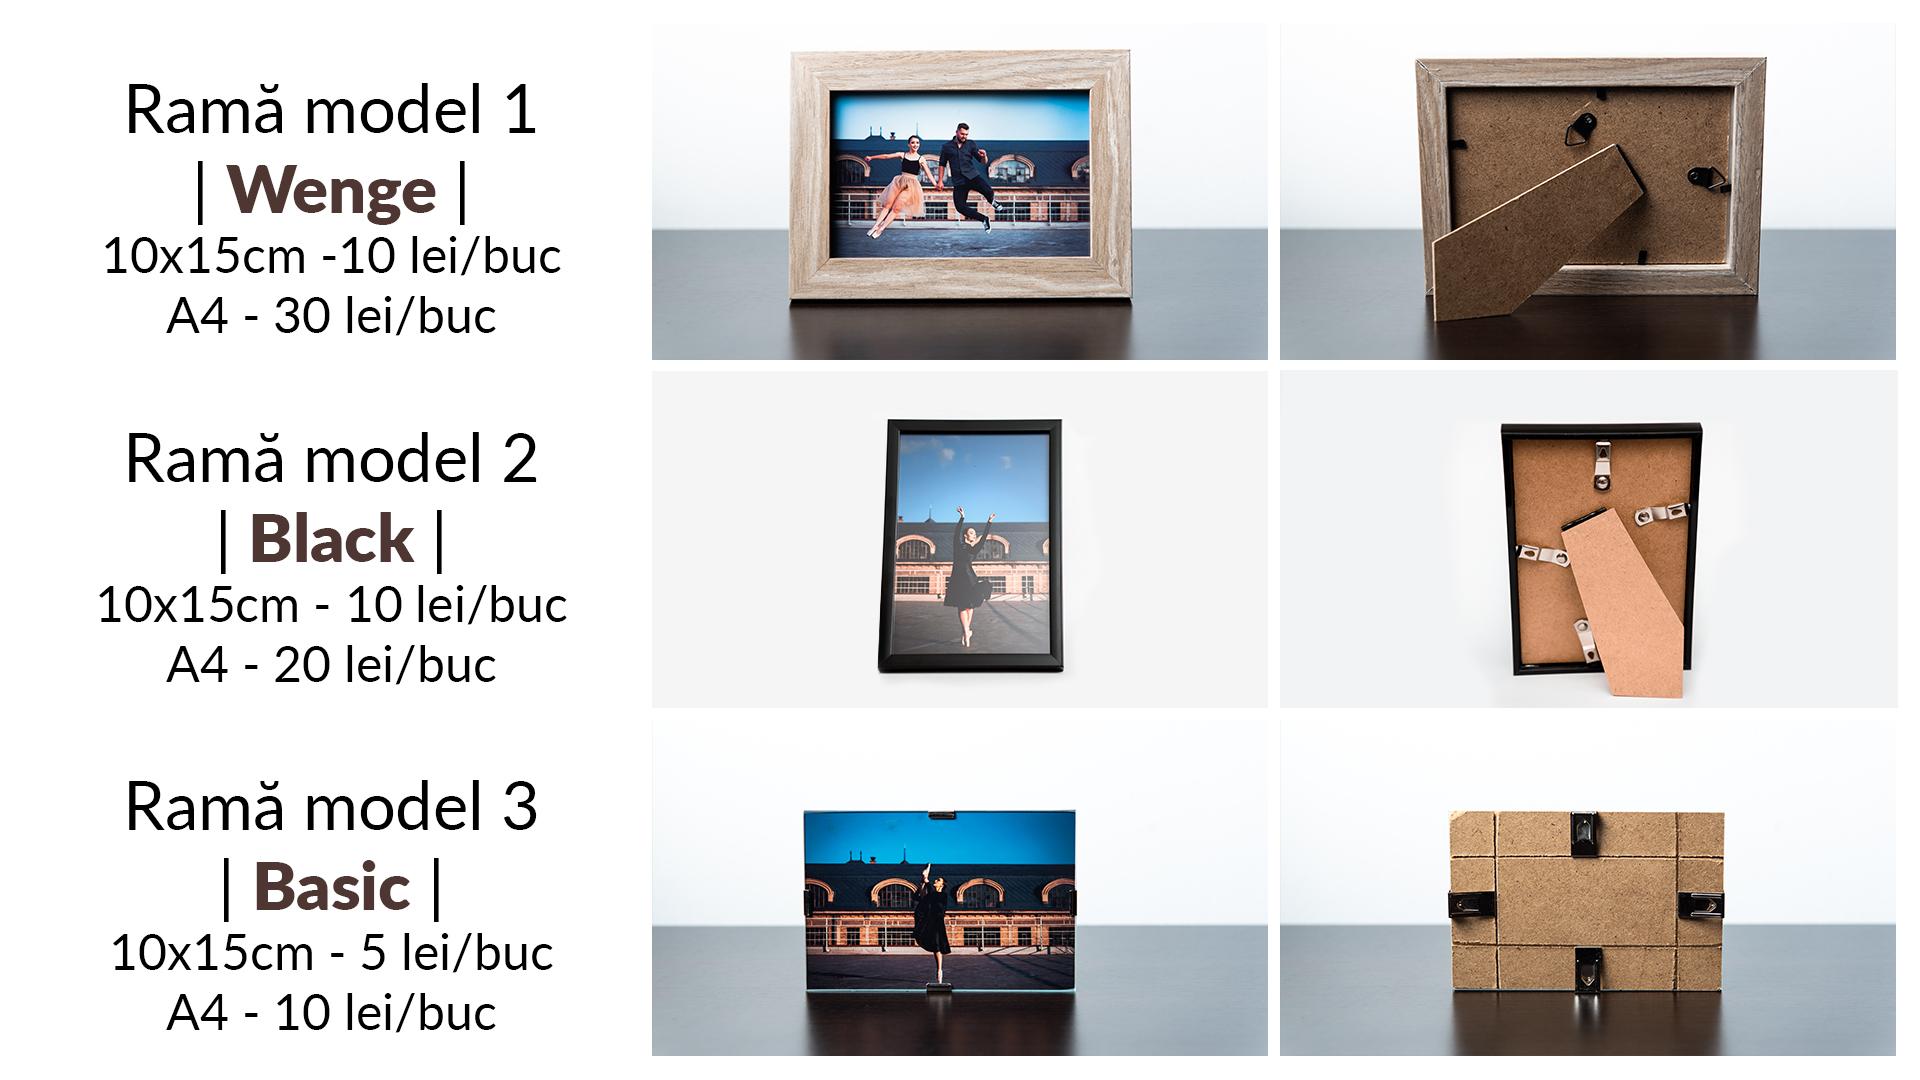 Rame fotografii - Stoc(10x15cm): Wenge - 0 buc, Black - 6 buc, Basic - 7 buc(A4): Wenge - 0 buc, Black - 1 buc, Basic - 3 buc